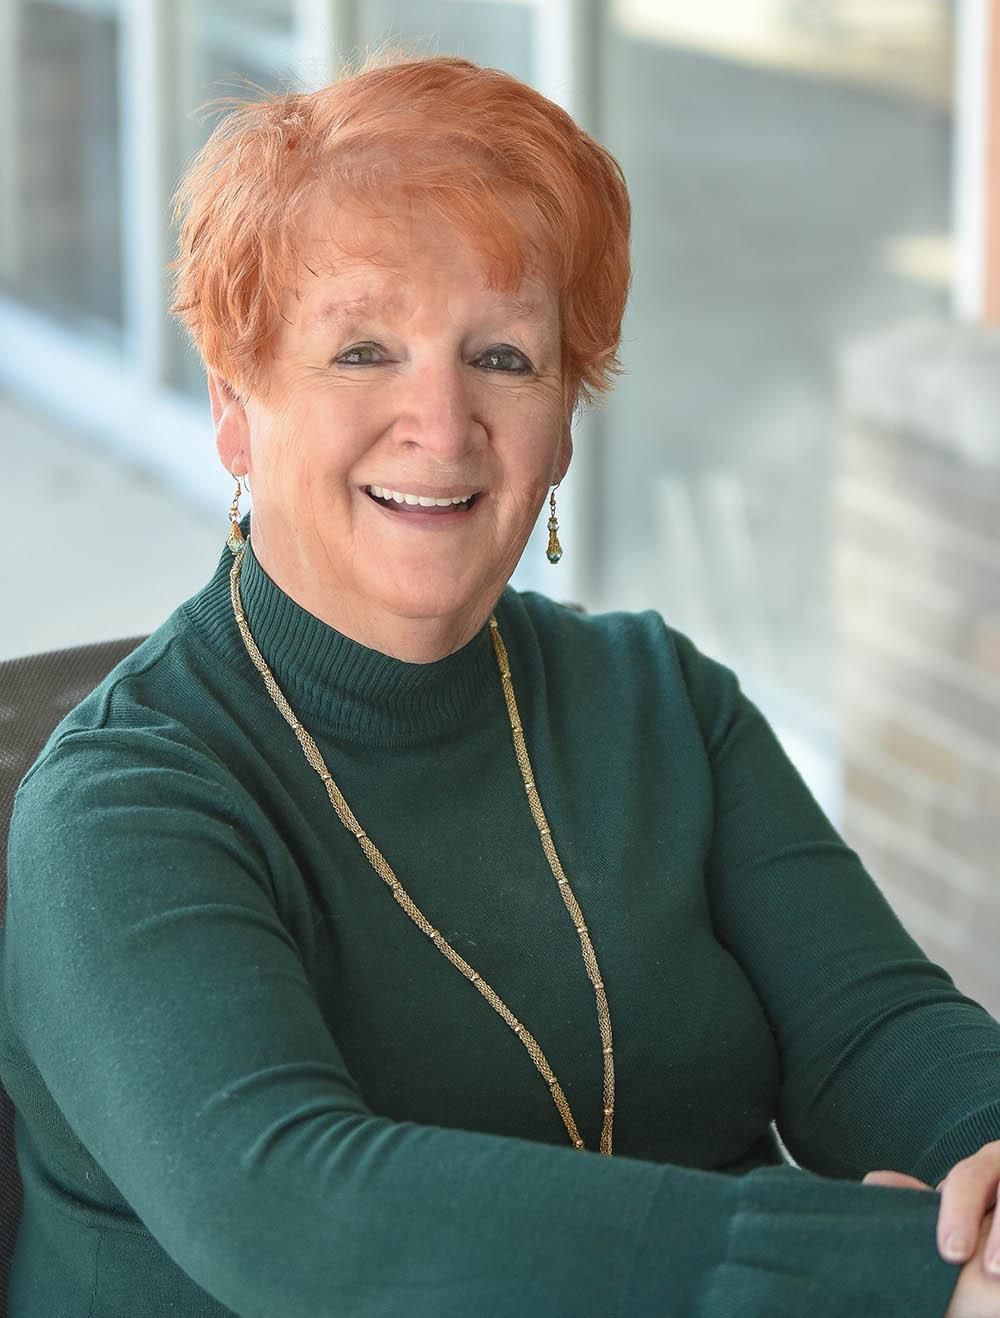 Patricia Hoodin